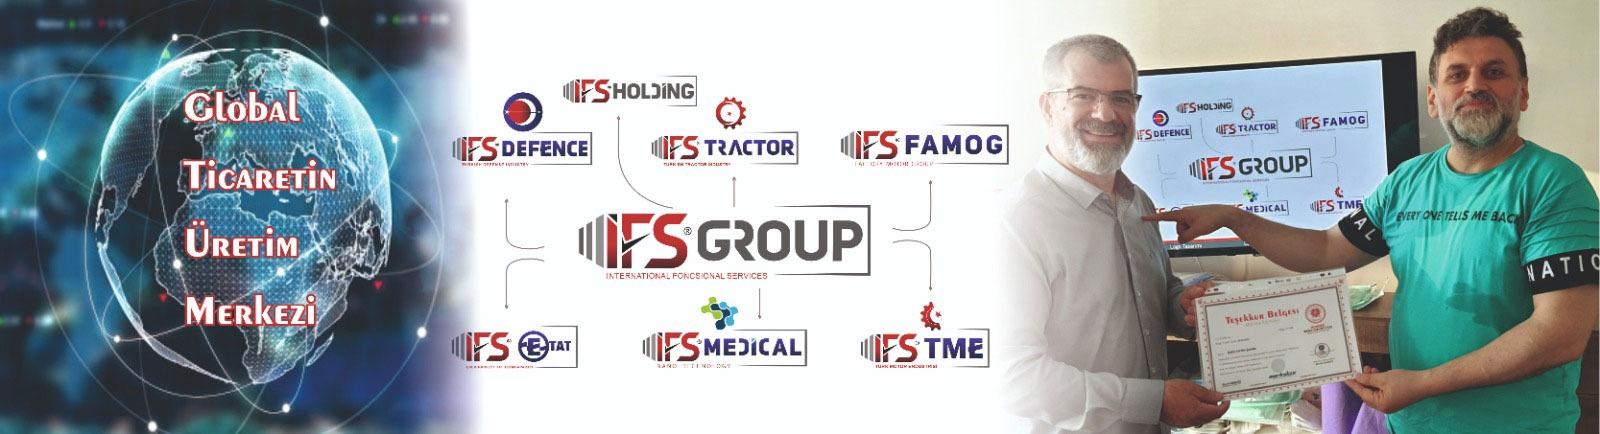 Global Ticaretin  Üretim Merkezi  İFS GROUP